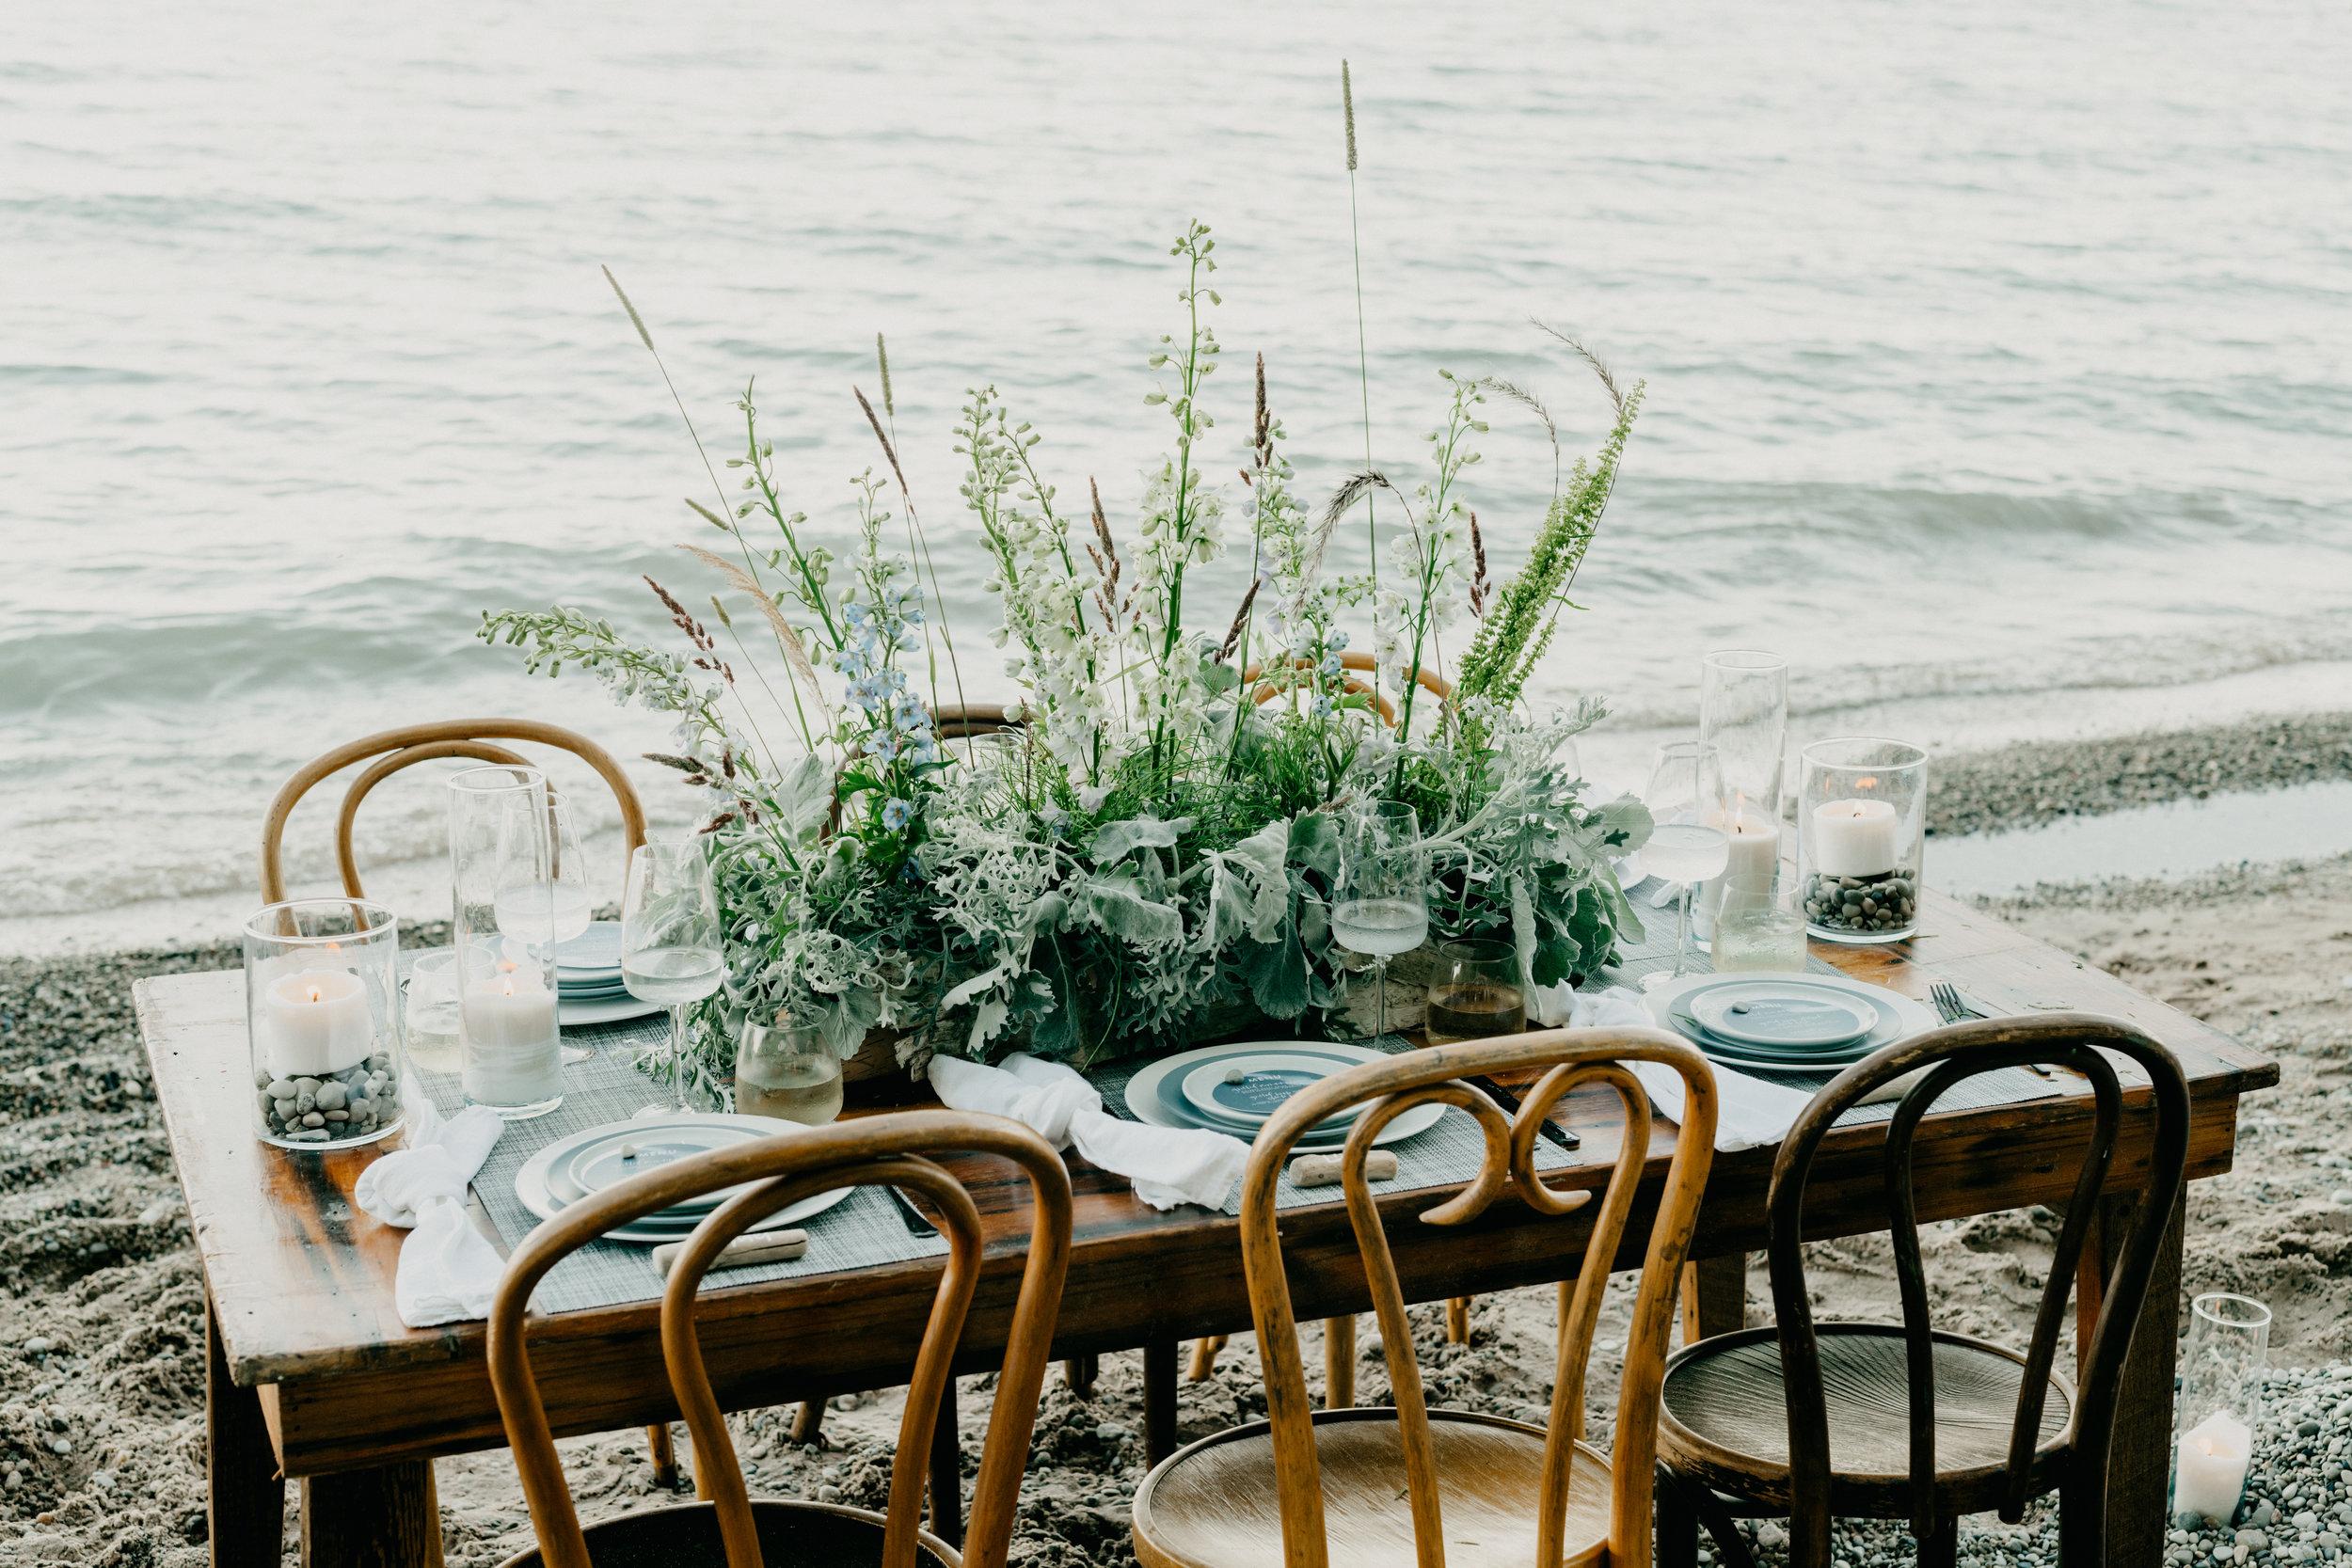 lake-table-8539.jpg